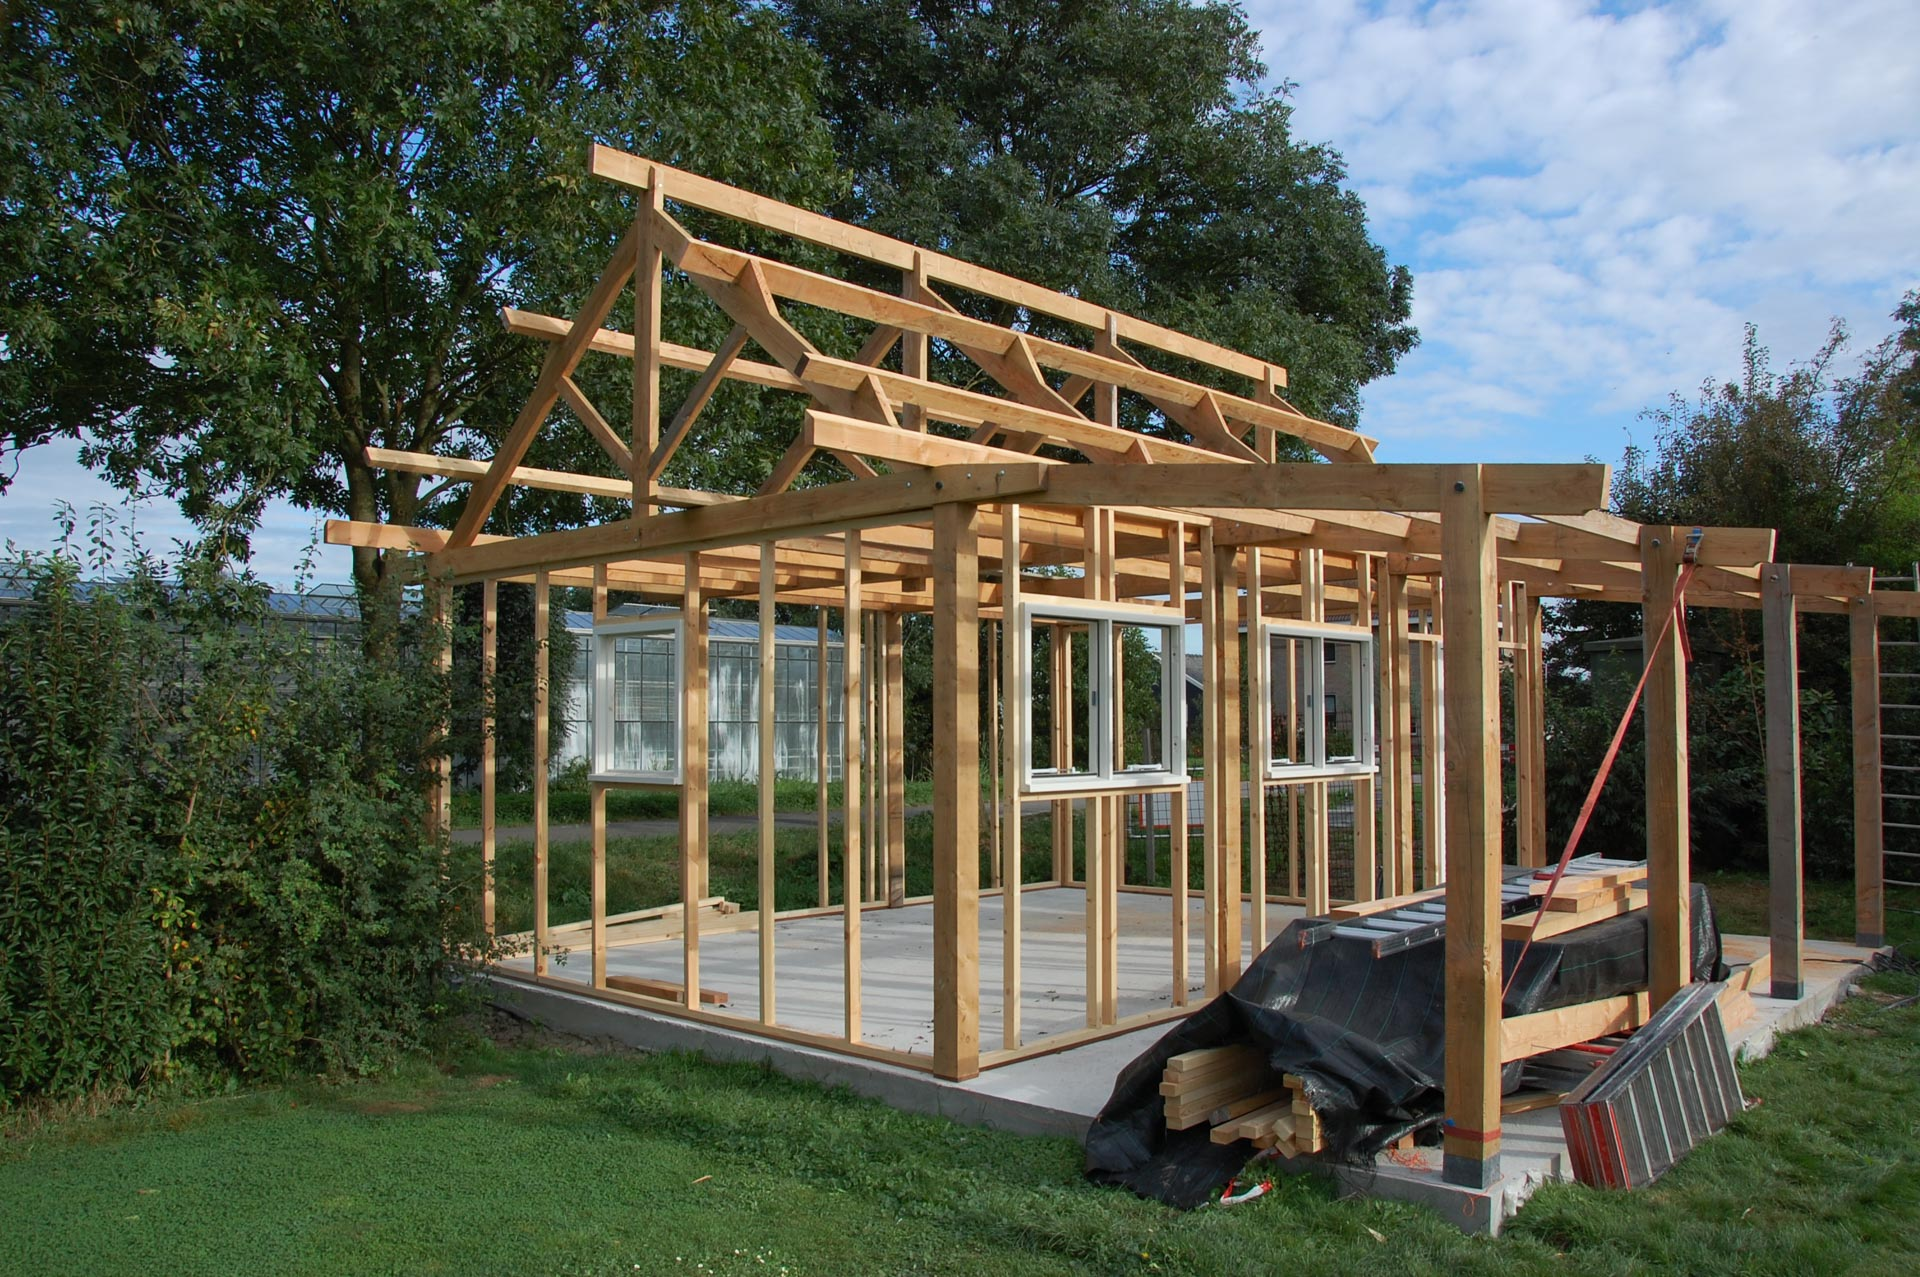 vos-hoveniers-project-tuinhuis-4